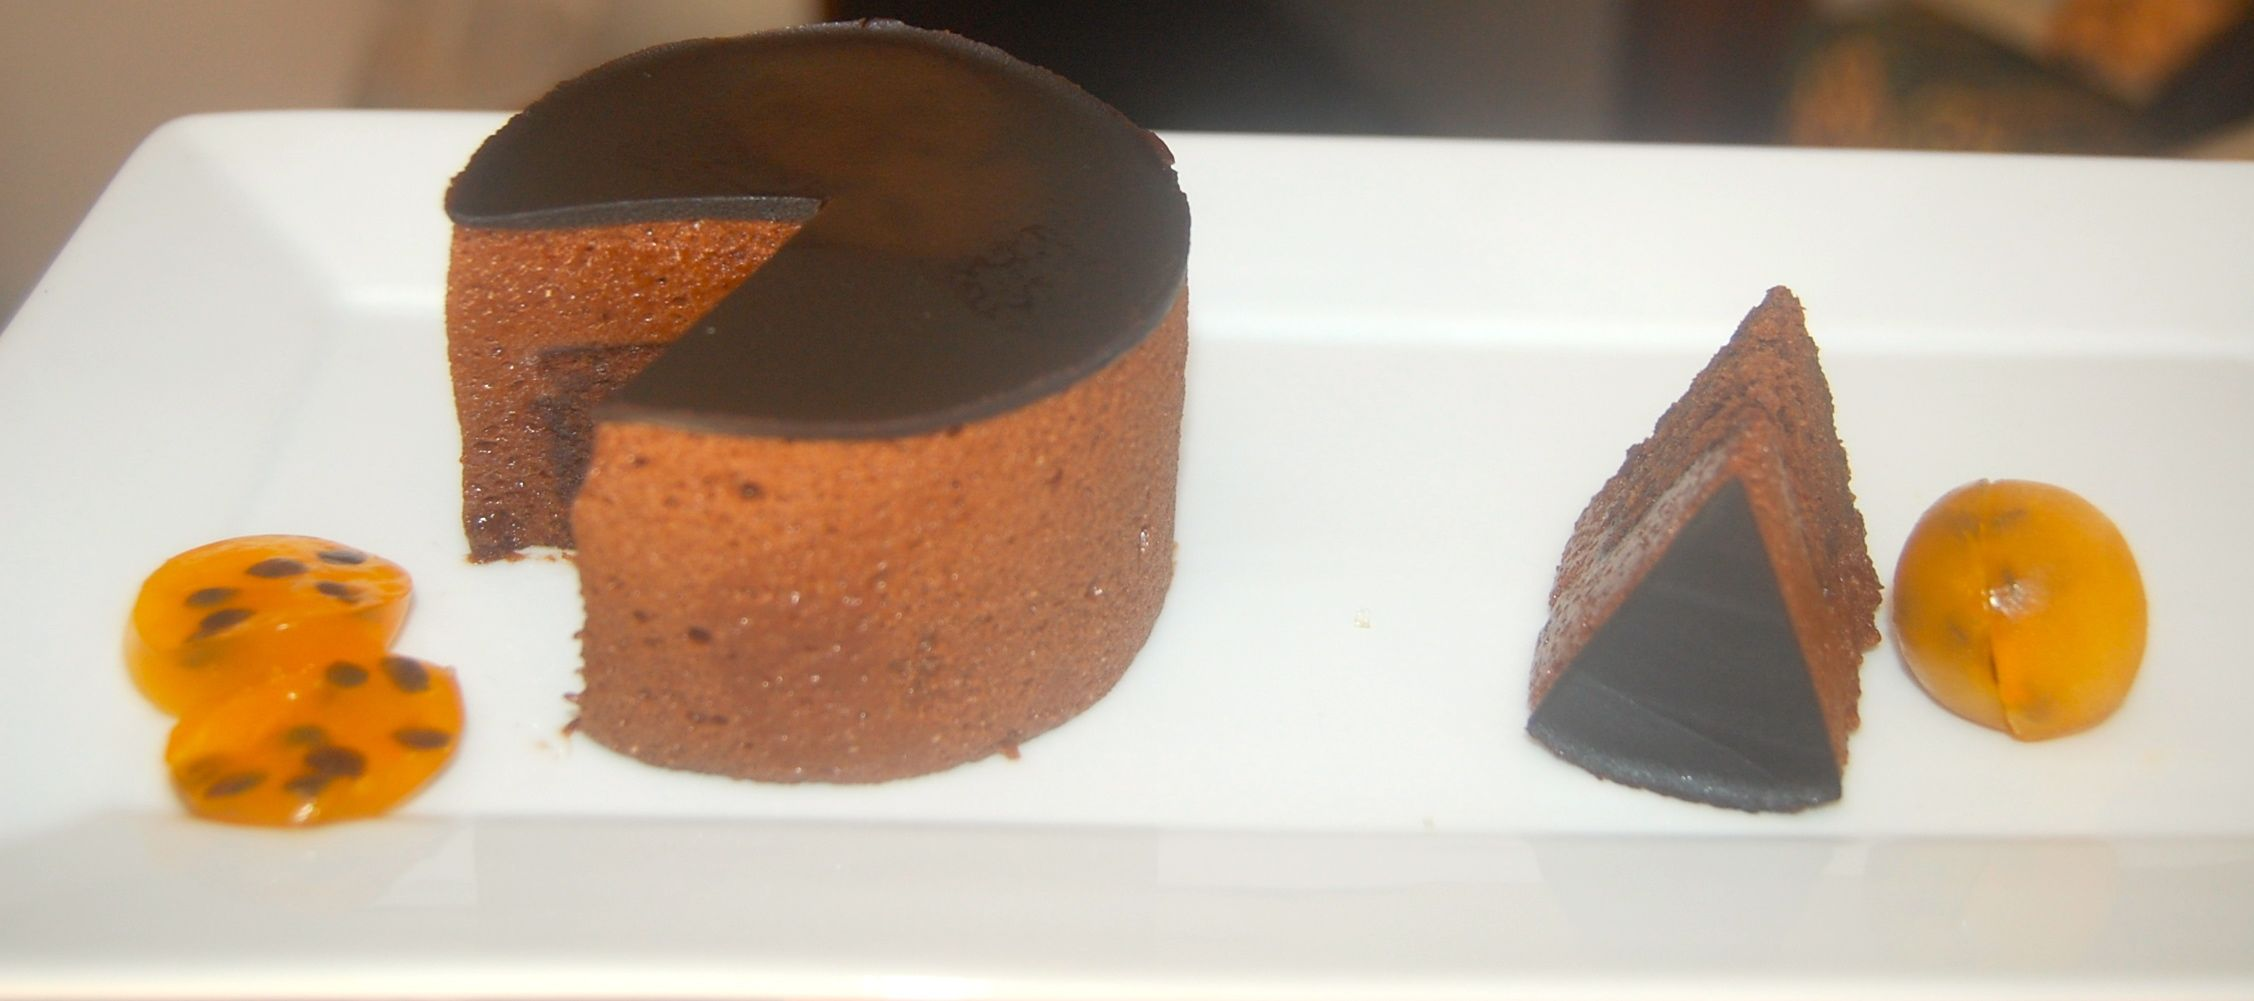 Marquise # trufado de chocolate#bavaroise de maracuyá.